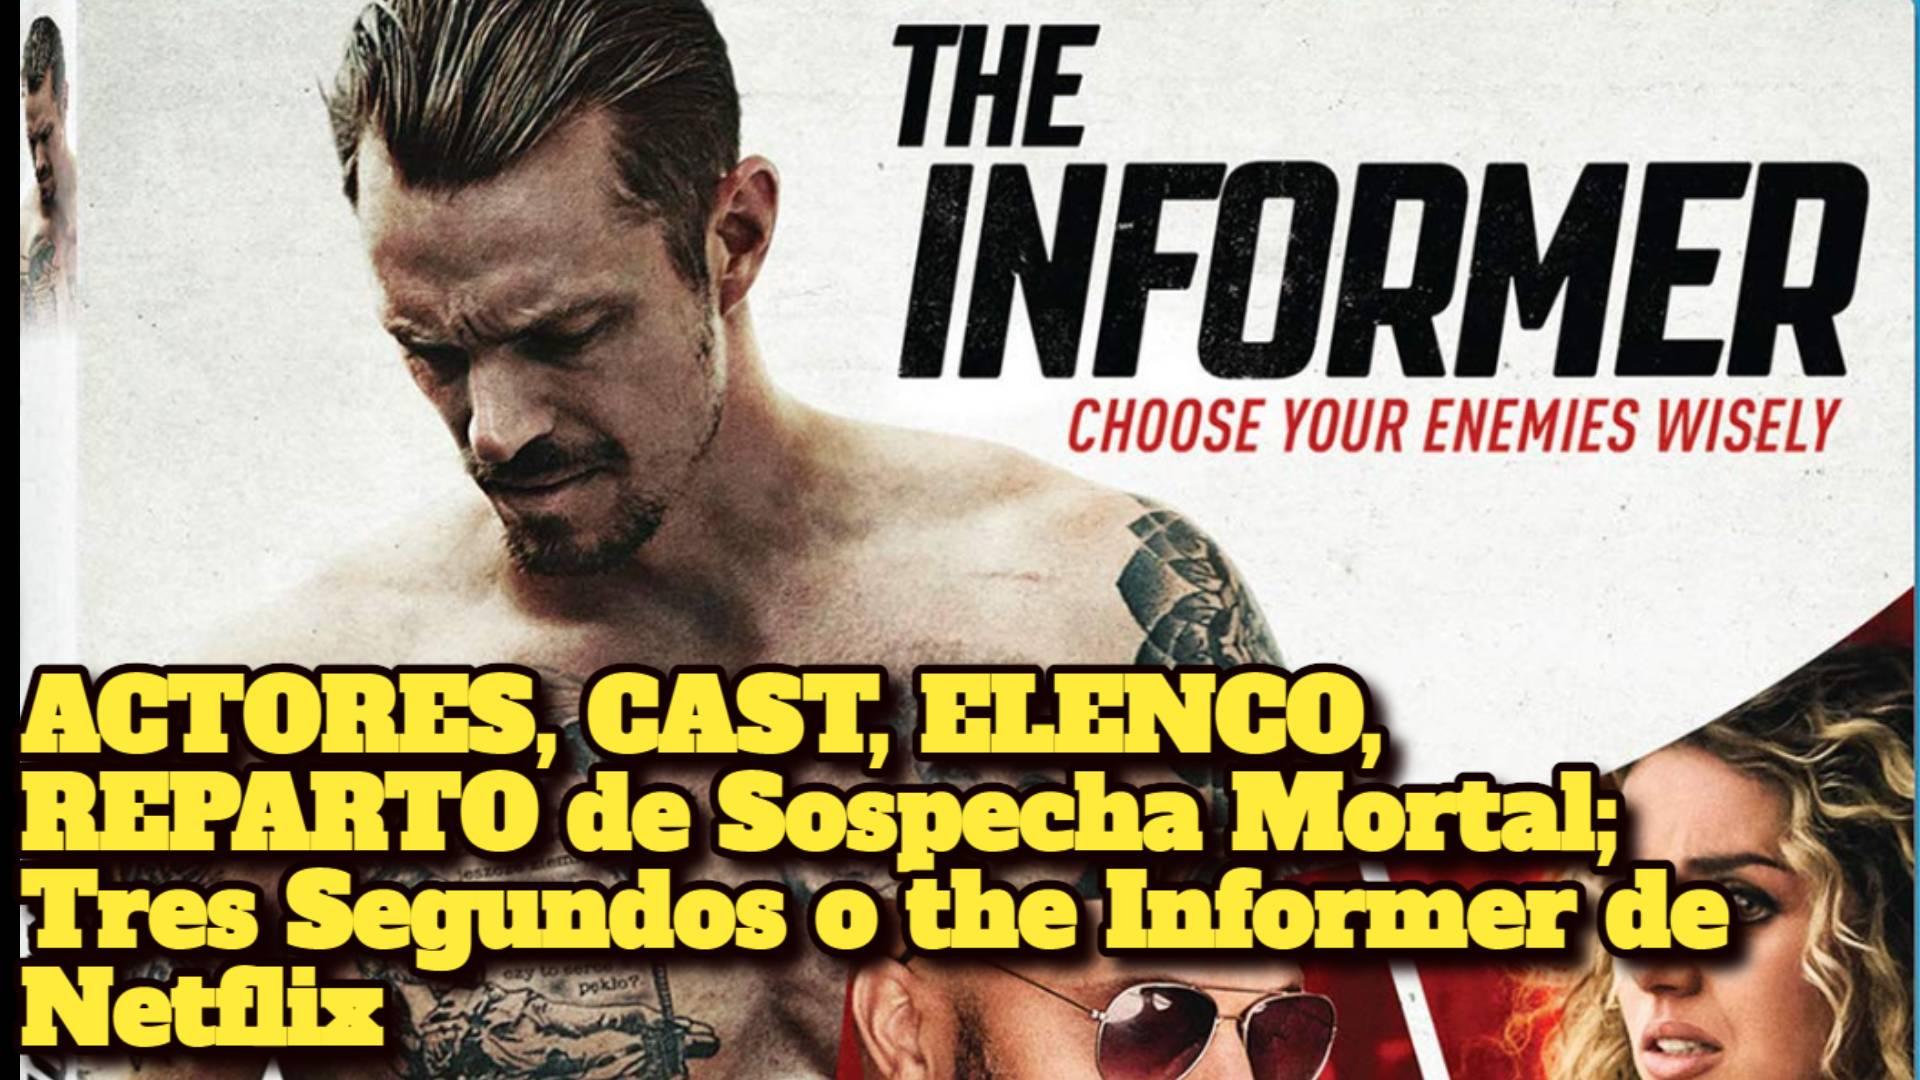 ACTORES, CAST, ELENCO, REPARTO de Sospecha Mortal; Tres Segundos o the Informer de Netflix